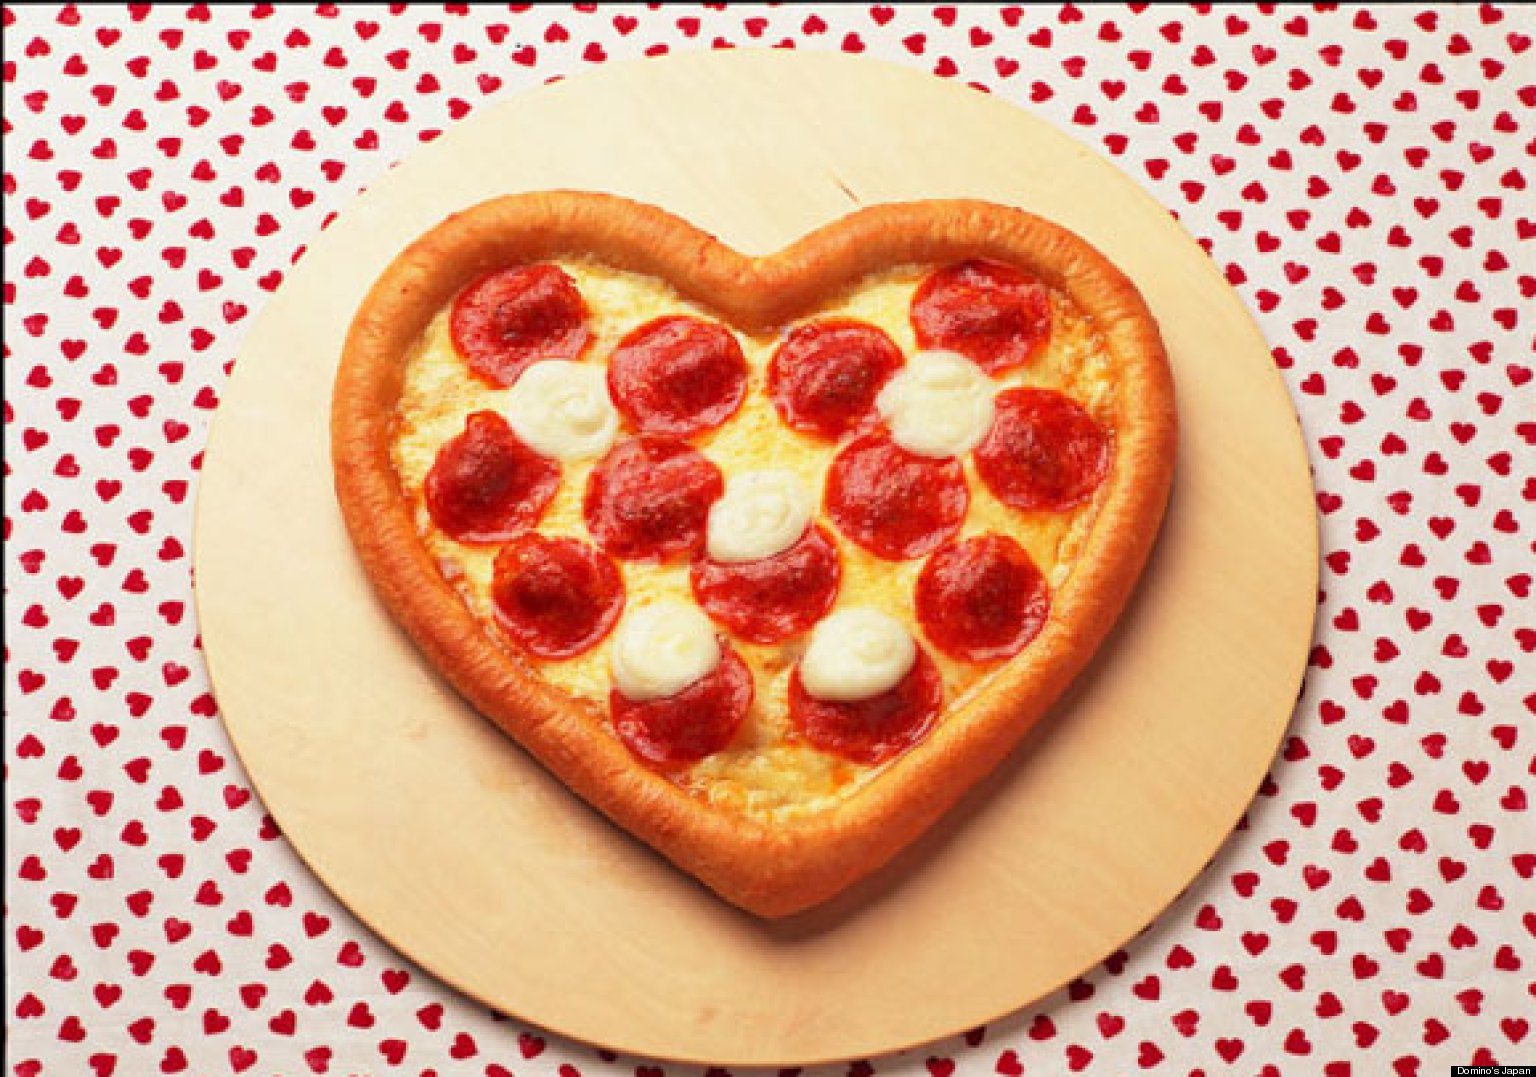 dominos japan debuts heartshaped pizza for valentines